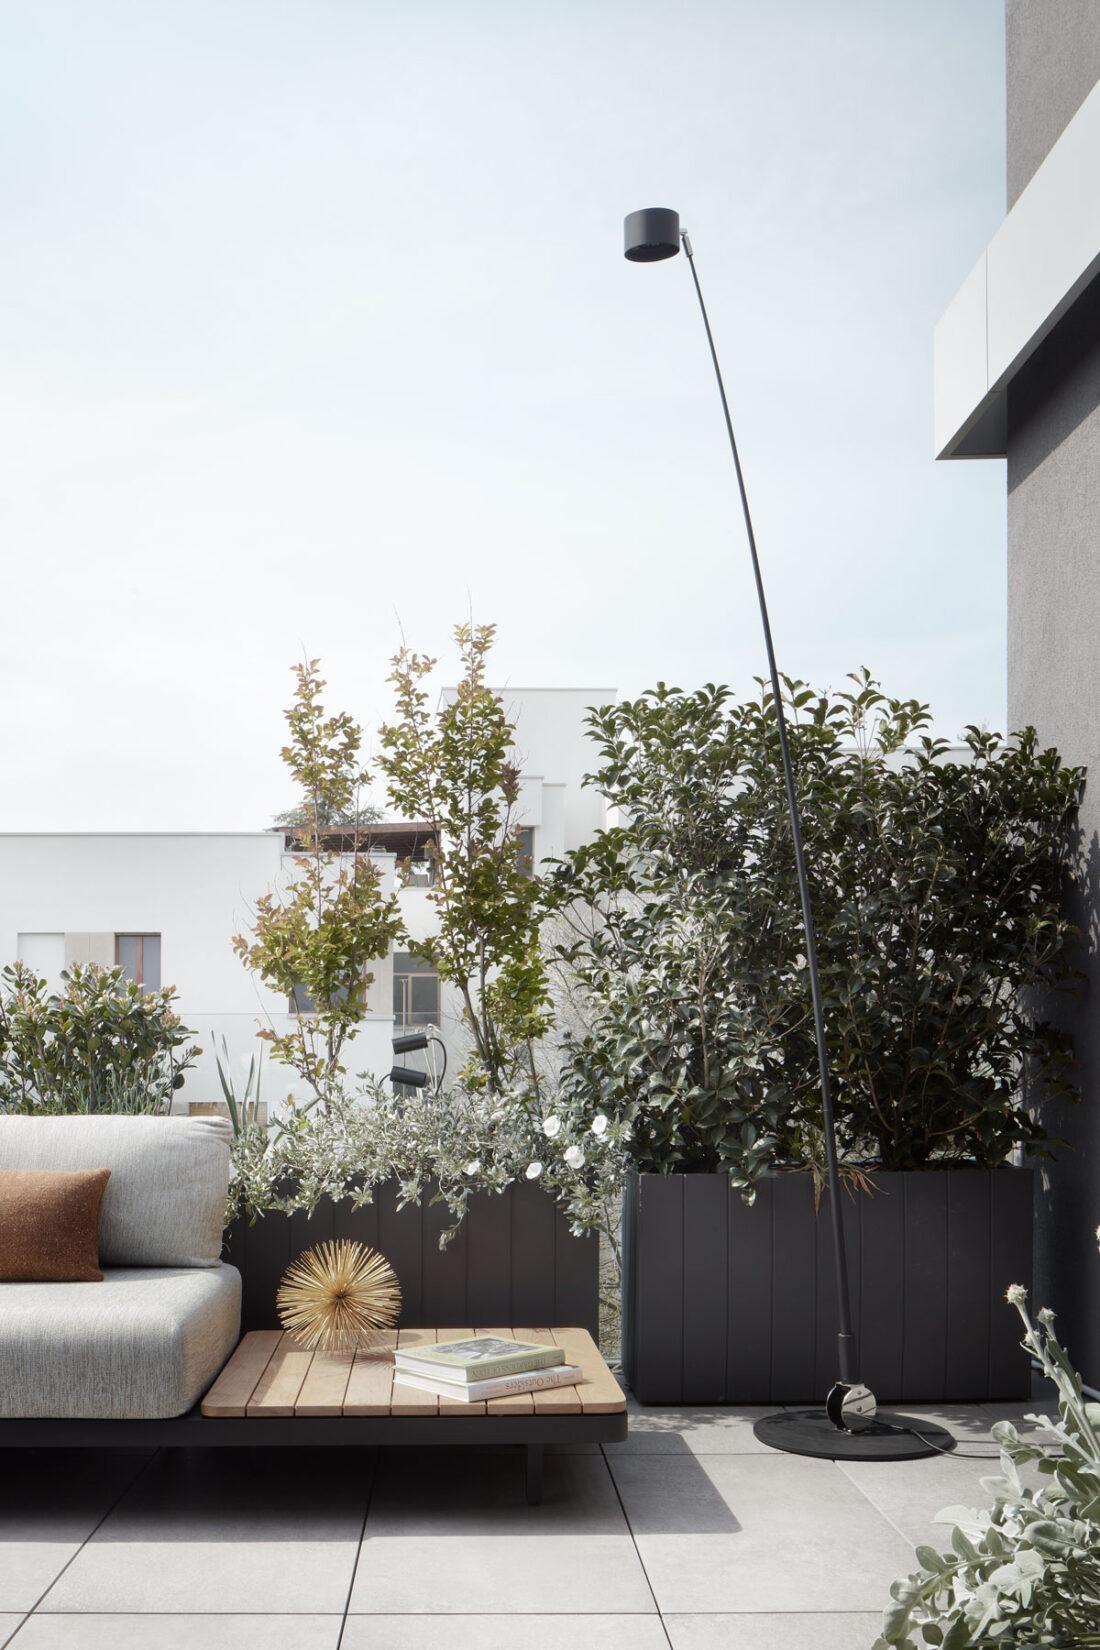 outdoor modern floor lamp in a penthouse terrace